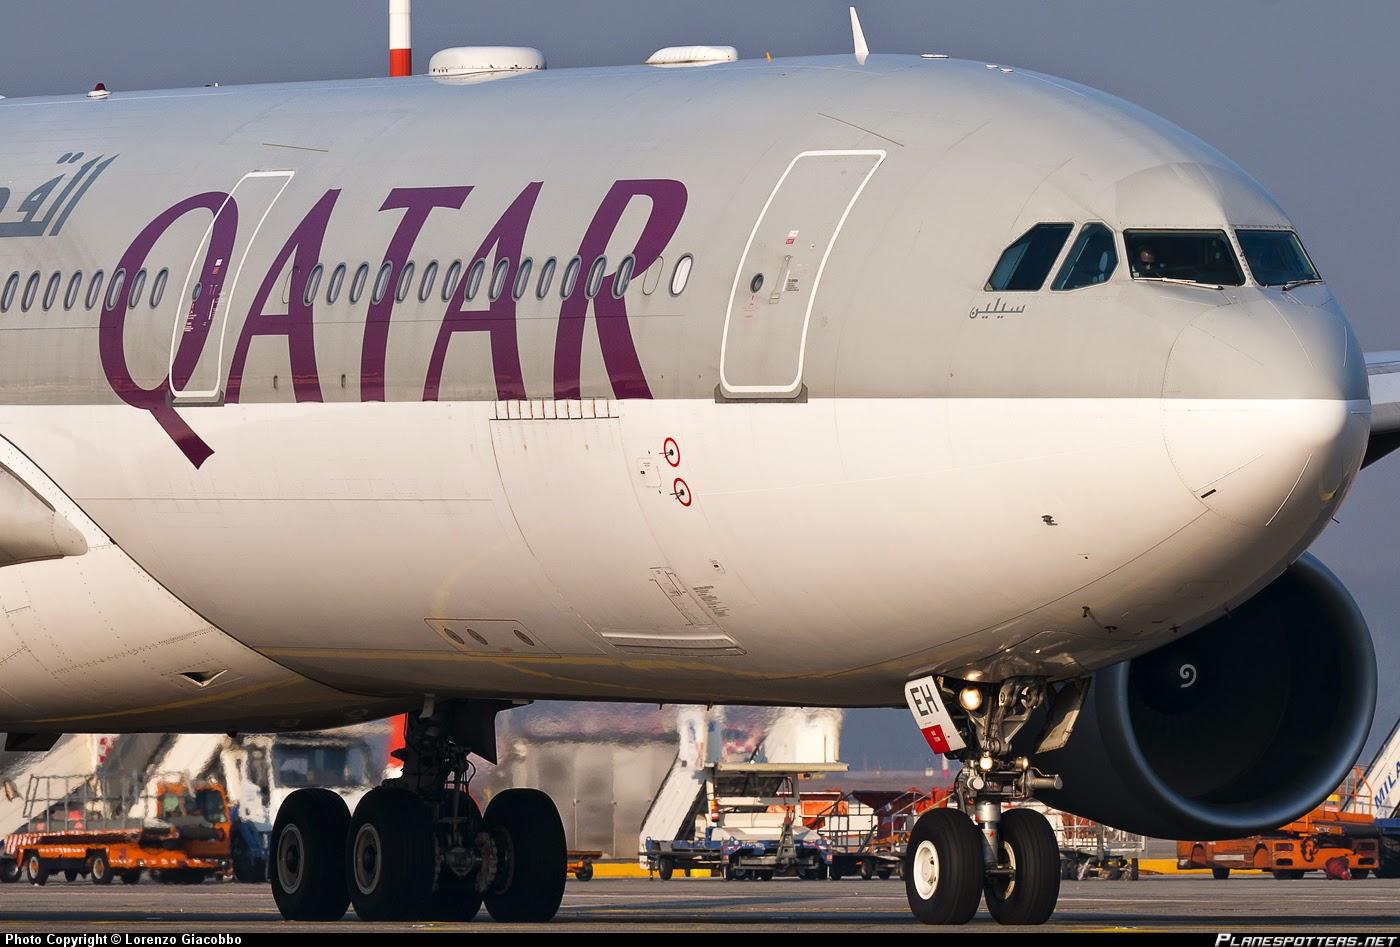 Qatar Airways Job Openings - April 2015